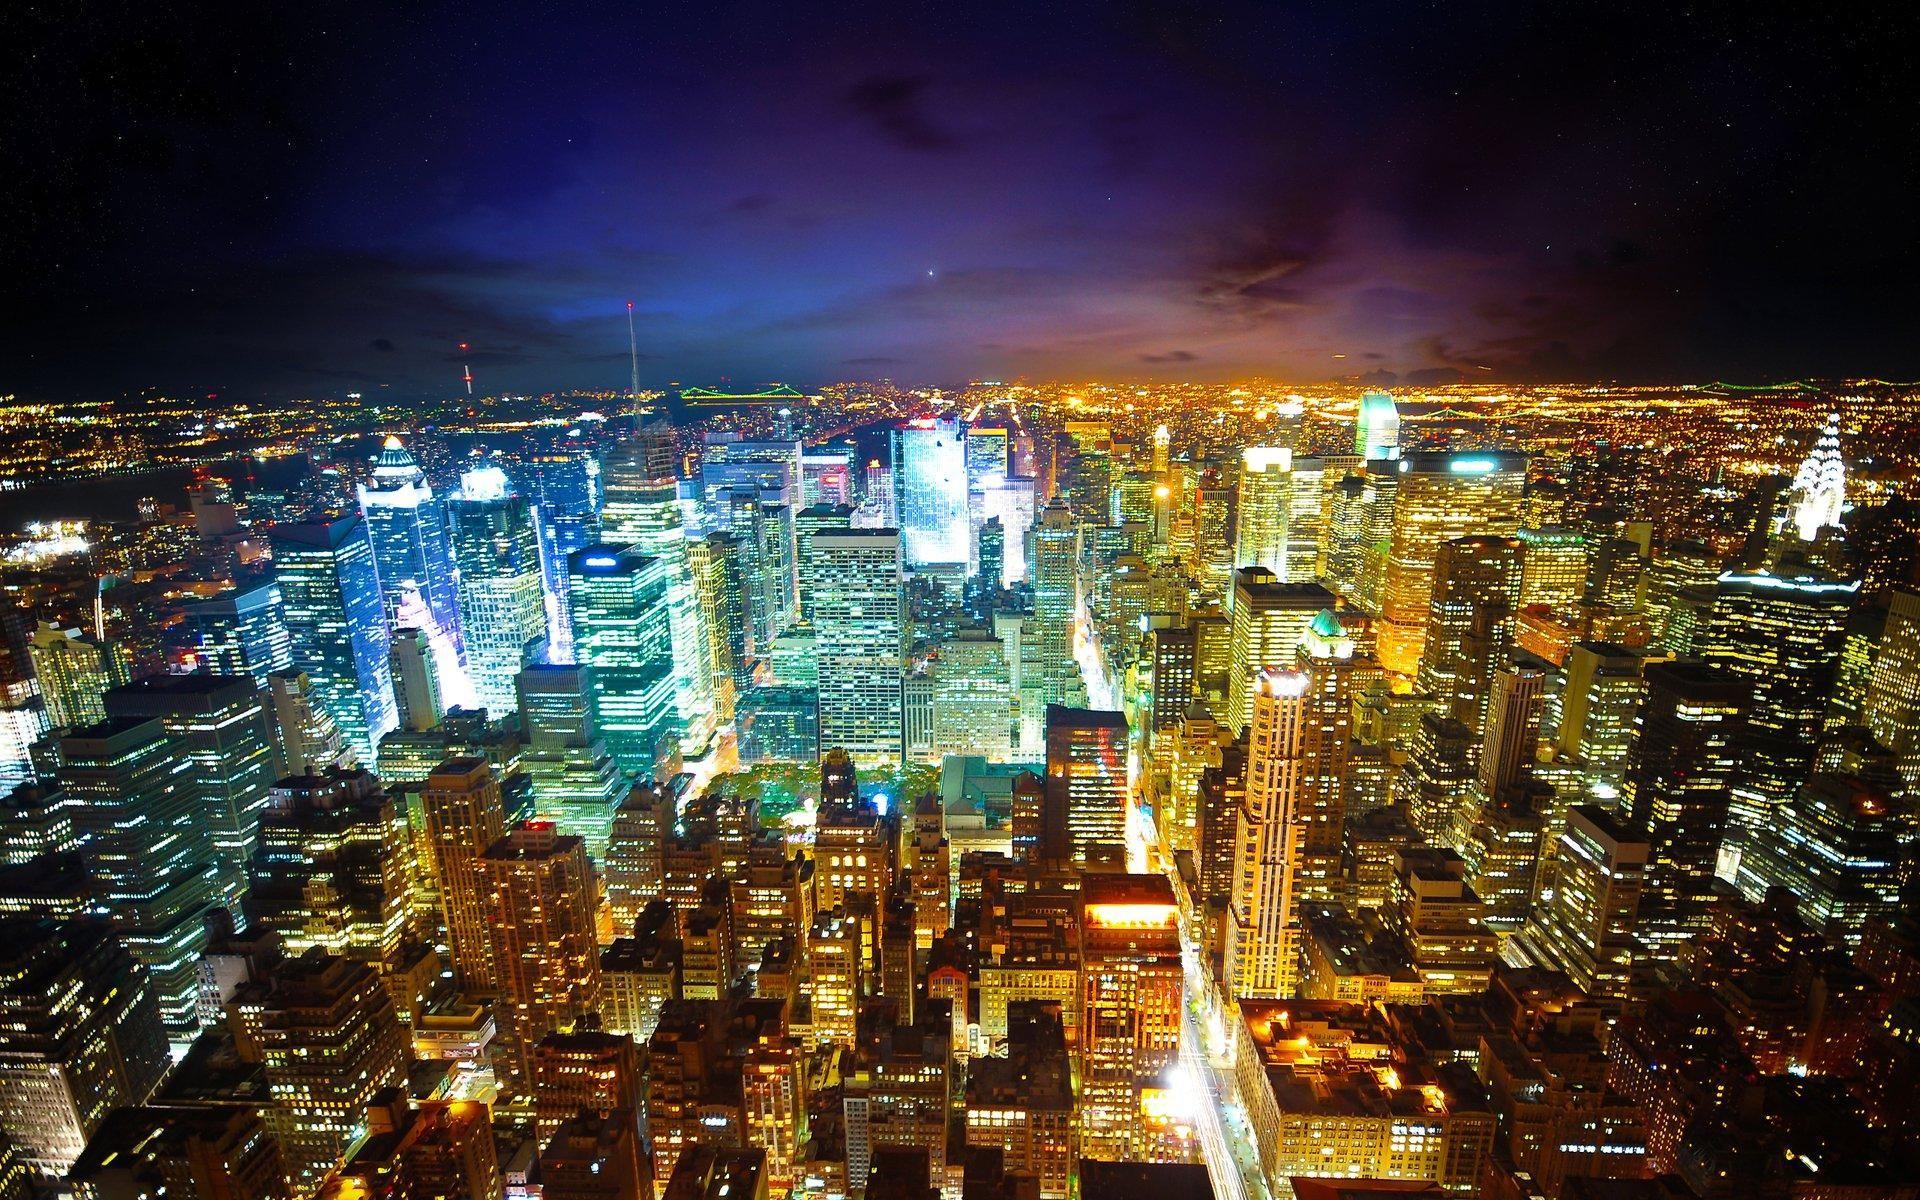 Night City Wallpaper Hd City Lights At Night City